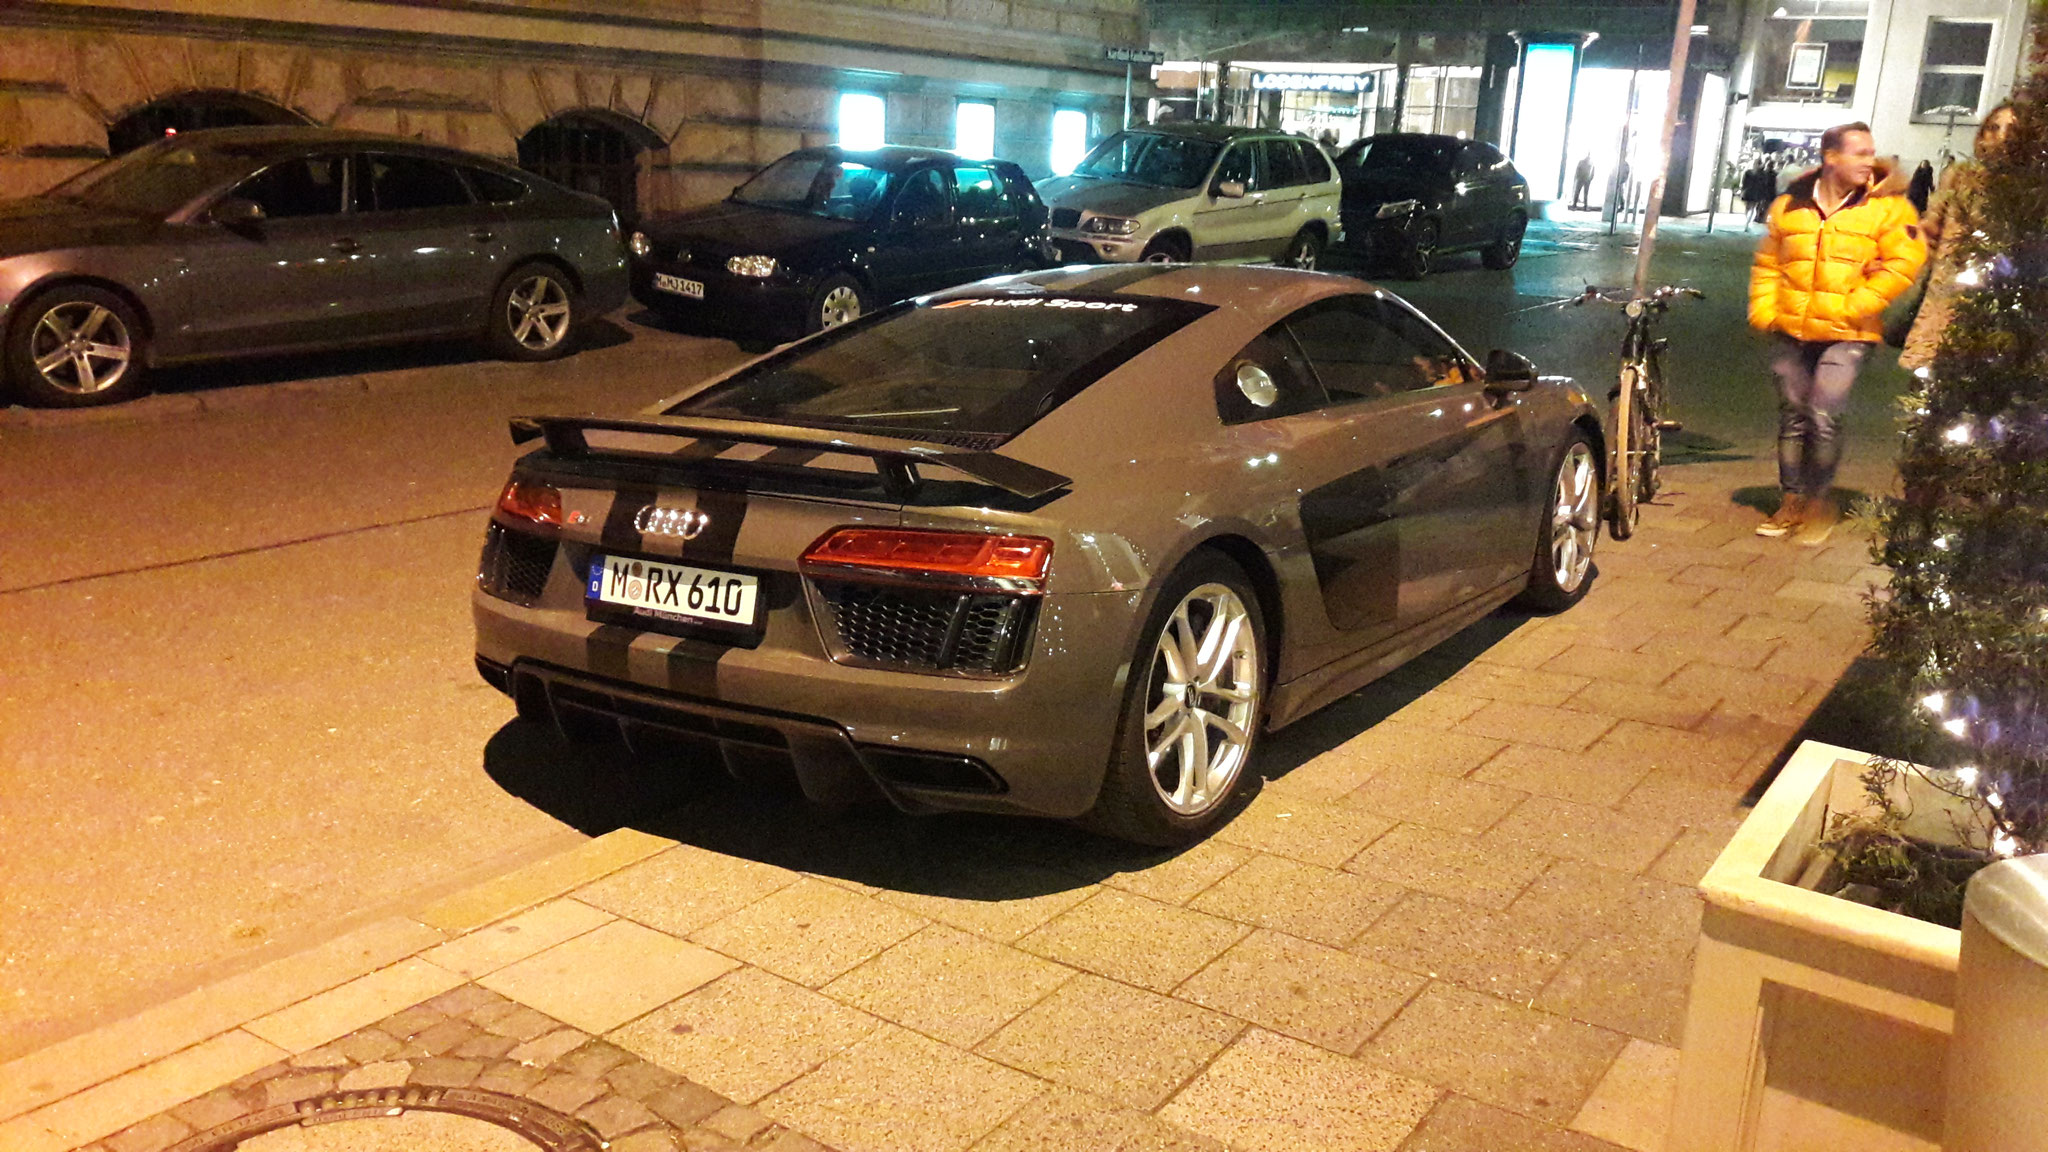 Audi R8 V10 - M-RX-610